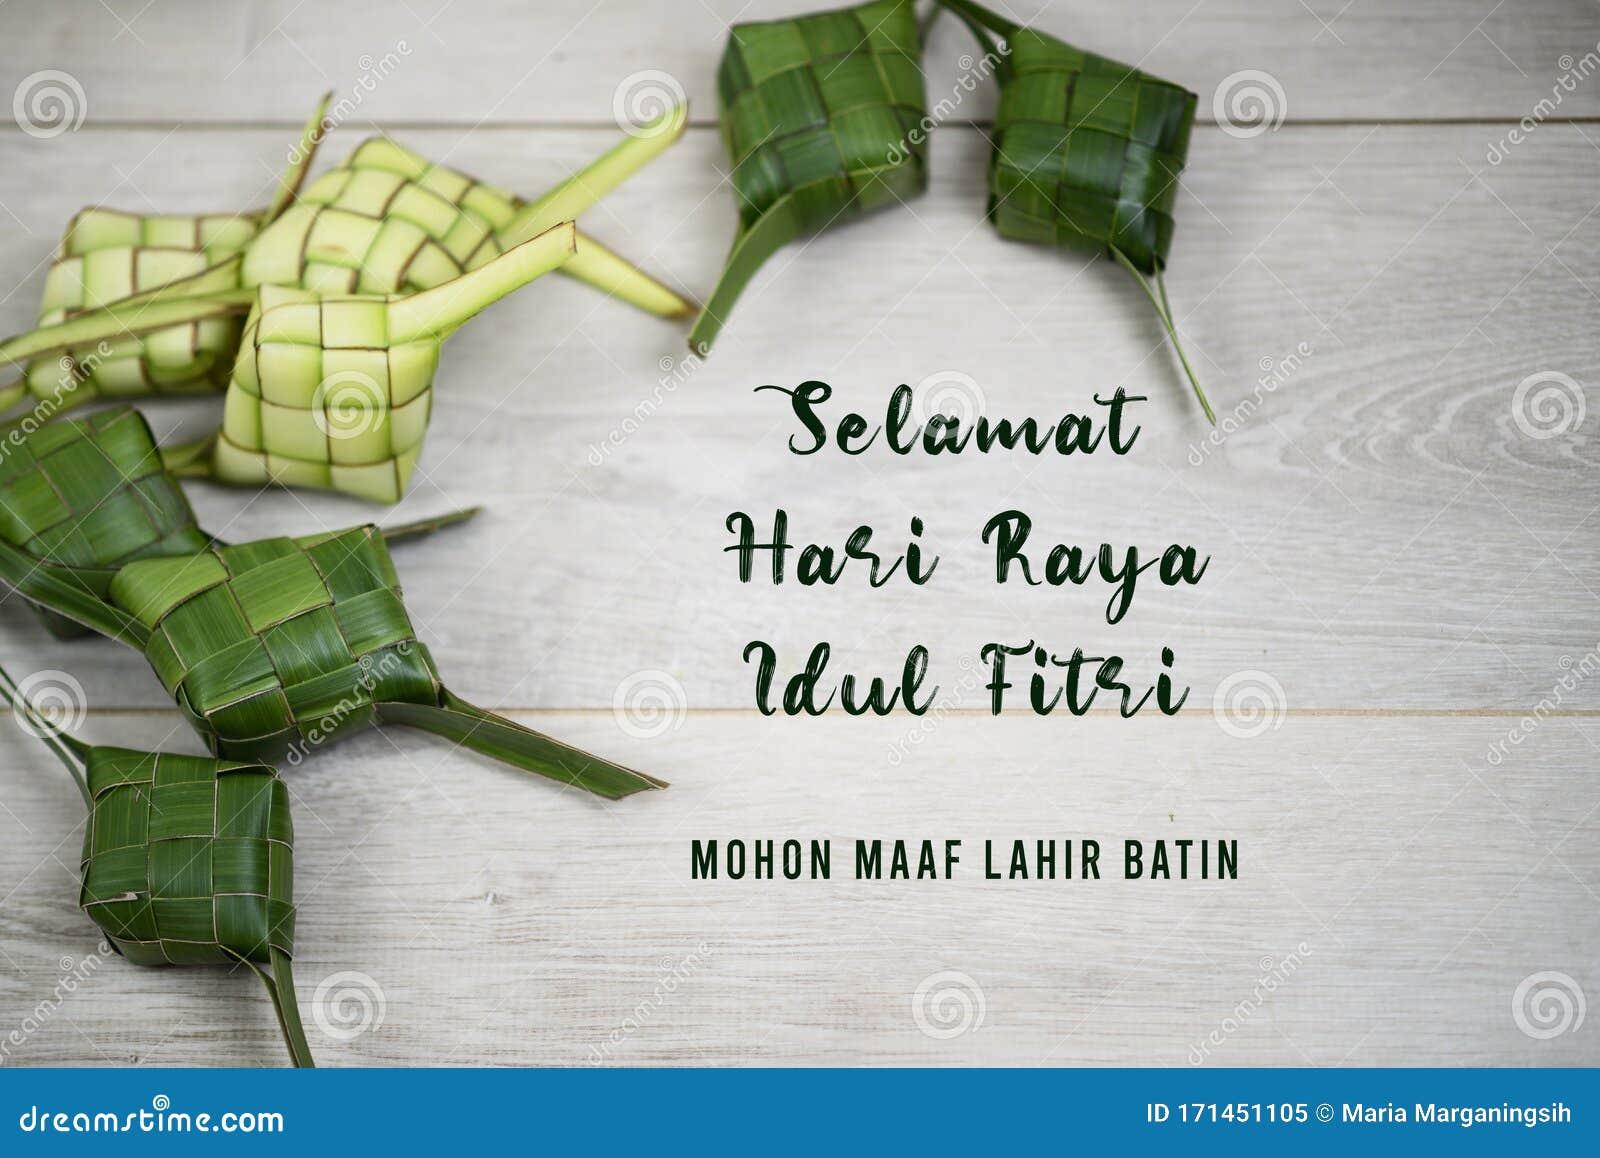 Eid Mubarak Celebration Card In Translate Bahasa Indonesia Malay Language Selamat Hari Raya Idul Fitri Mohon Maaf Lahir Batin Stock Image Image Of Green Fitr 171451105